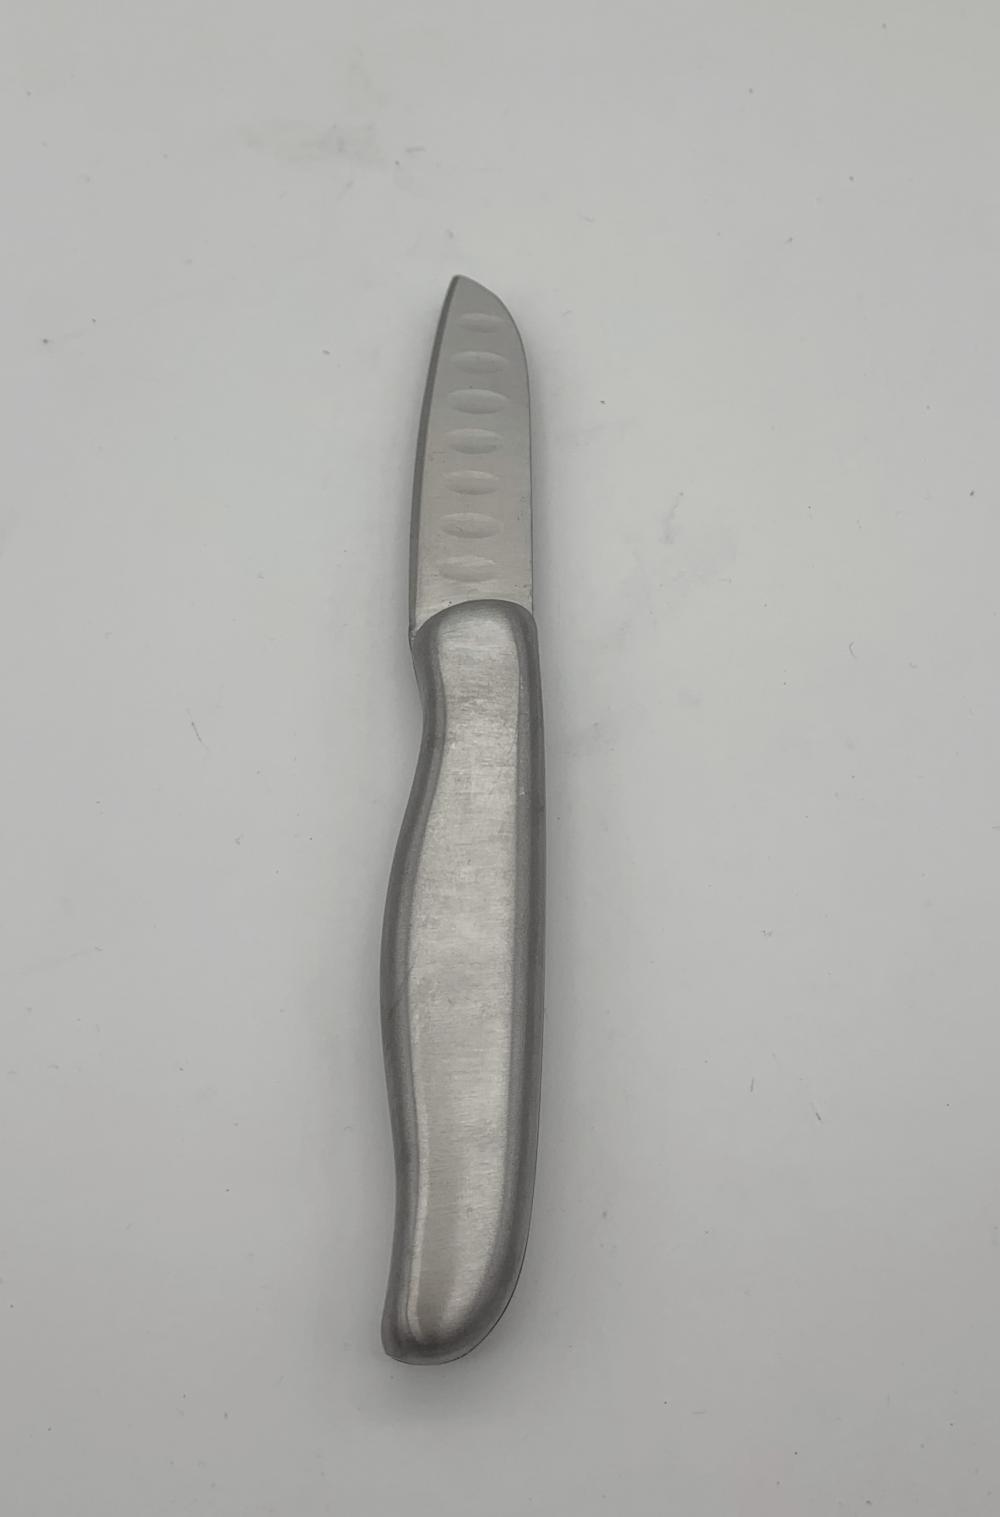 Paring Knife